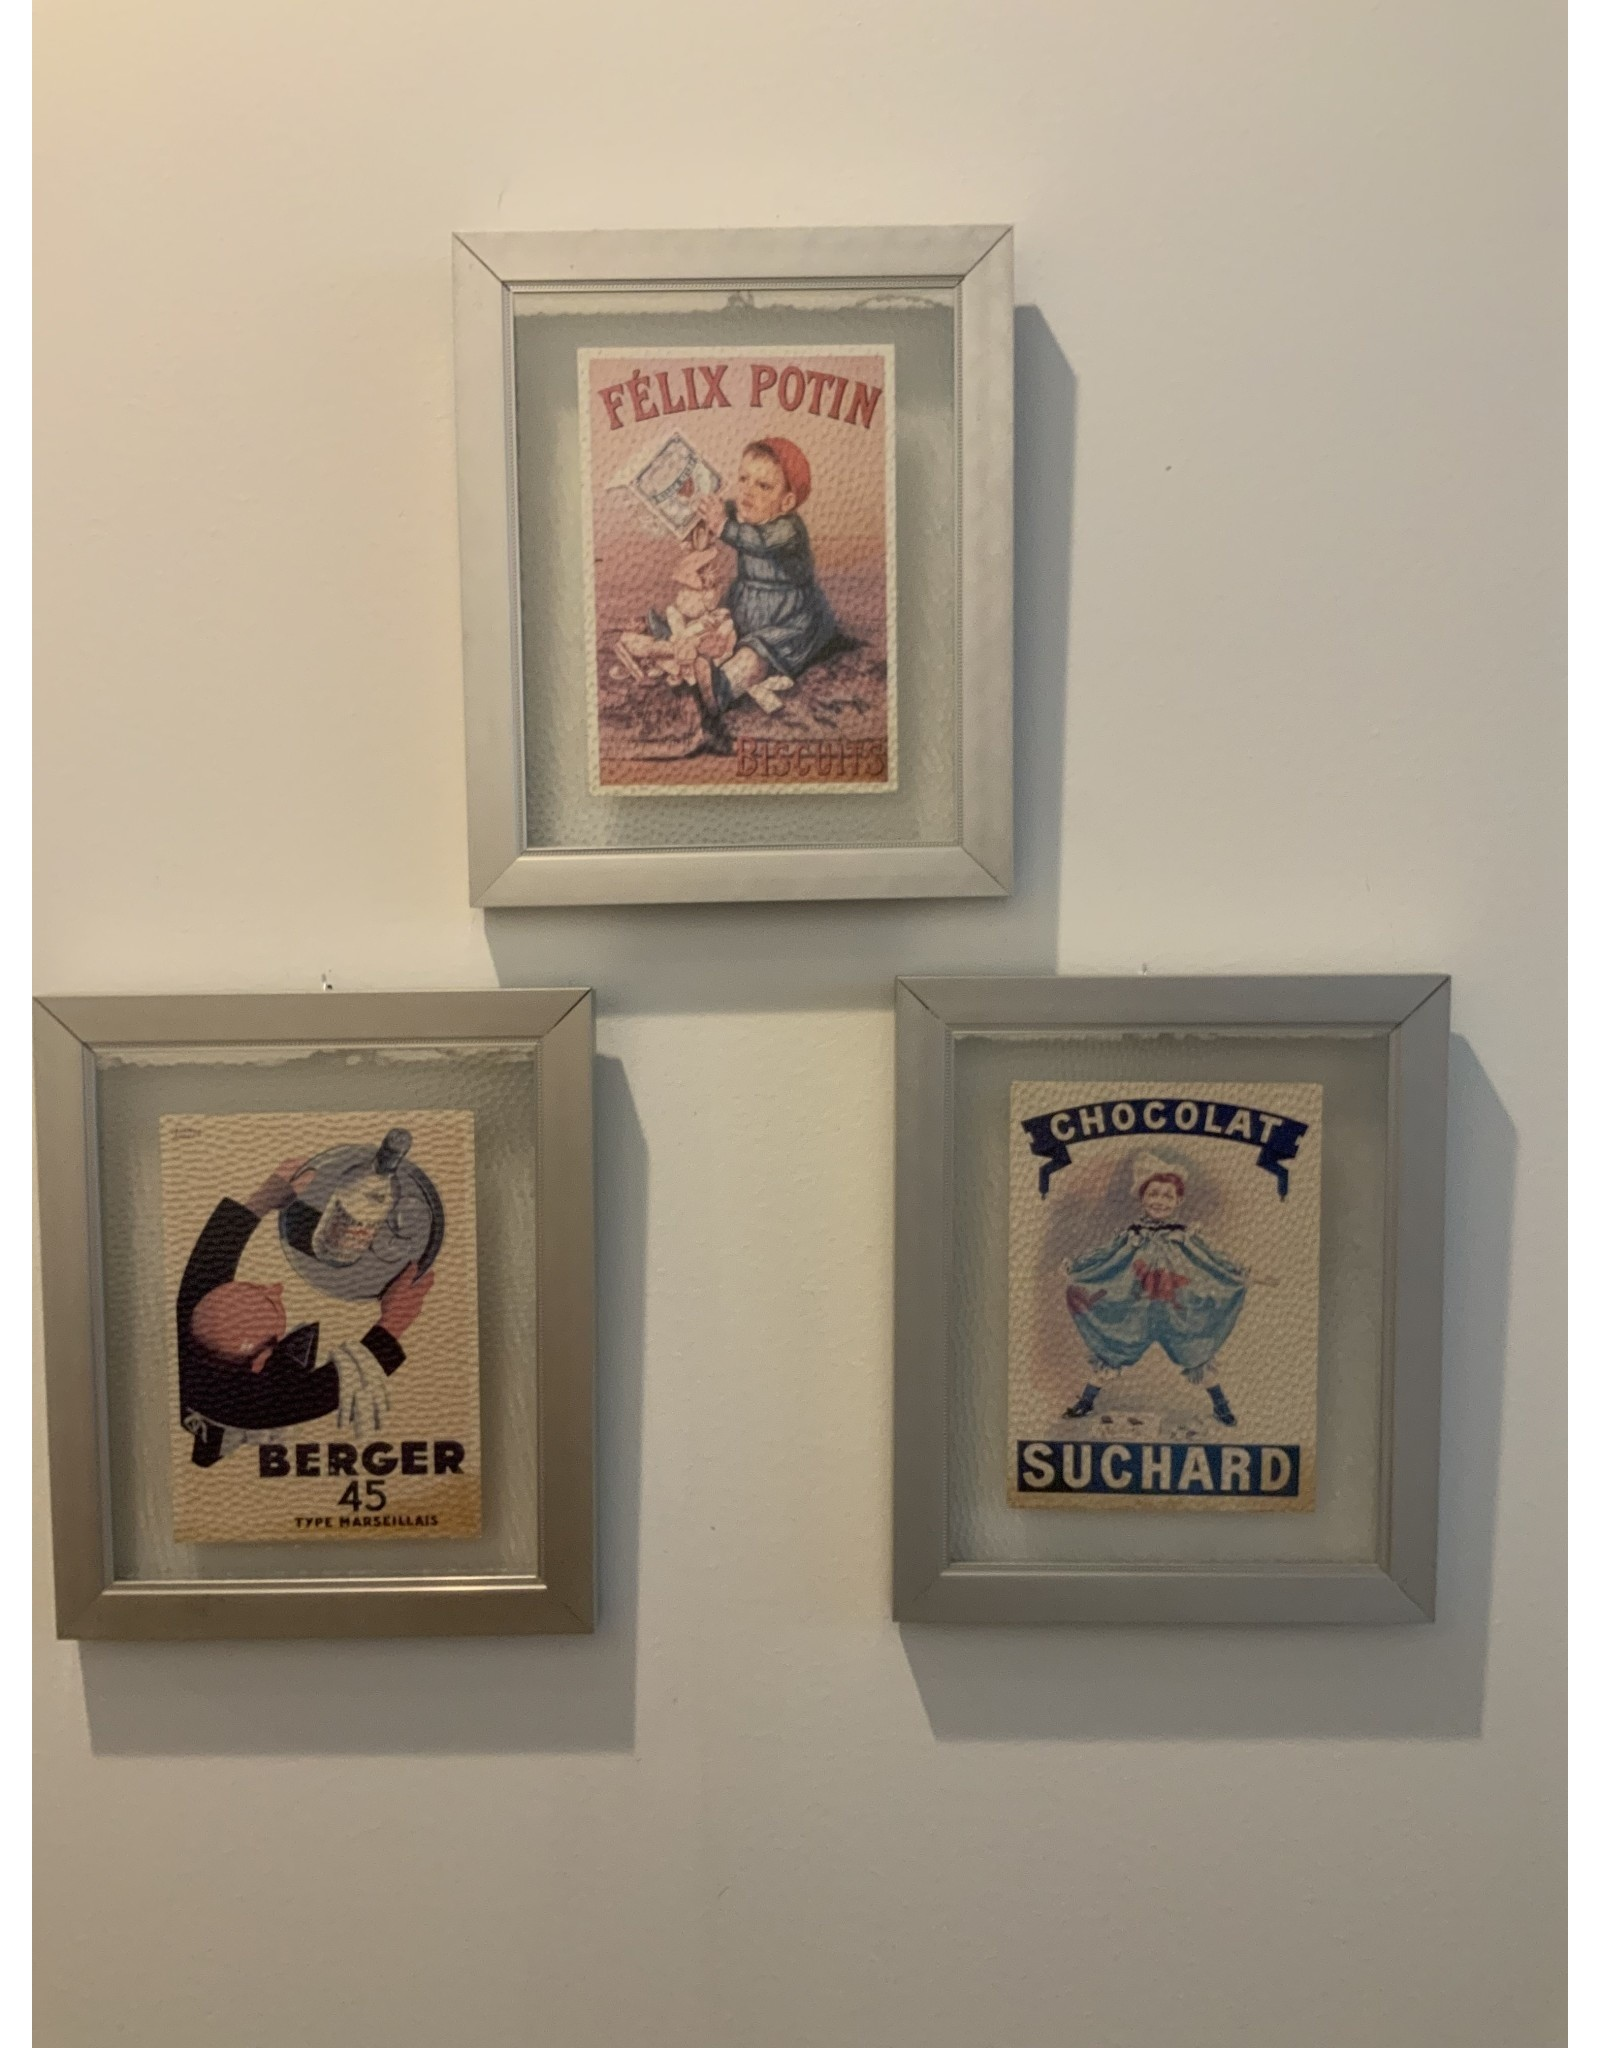 SPV Set of three frames vintage postcard adds